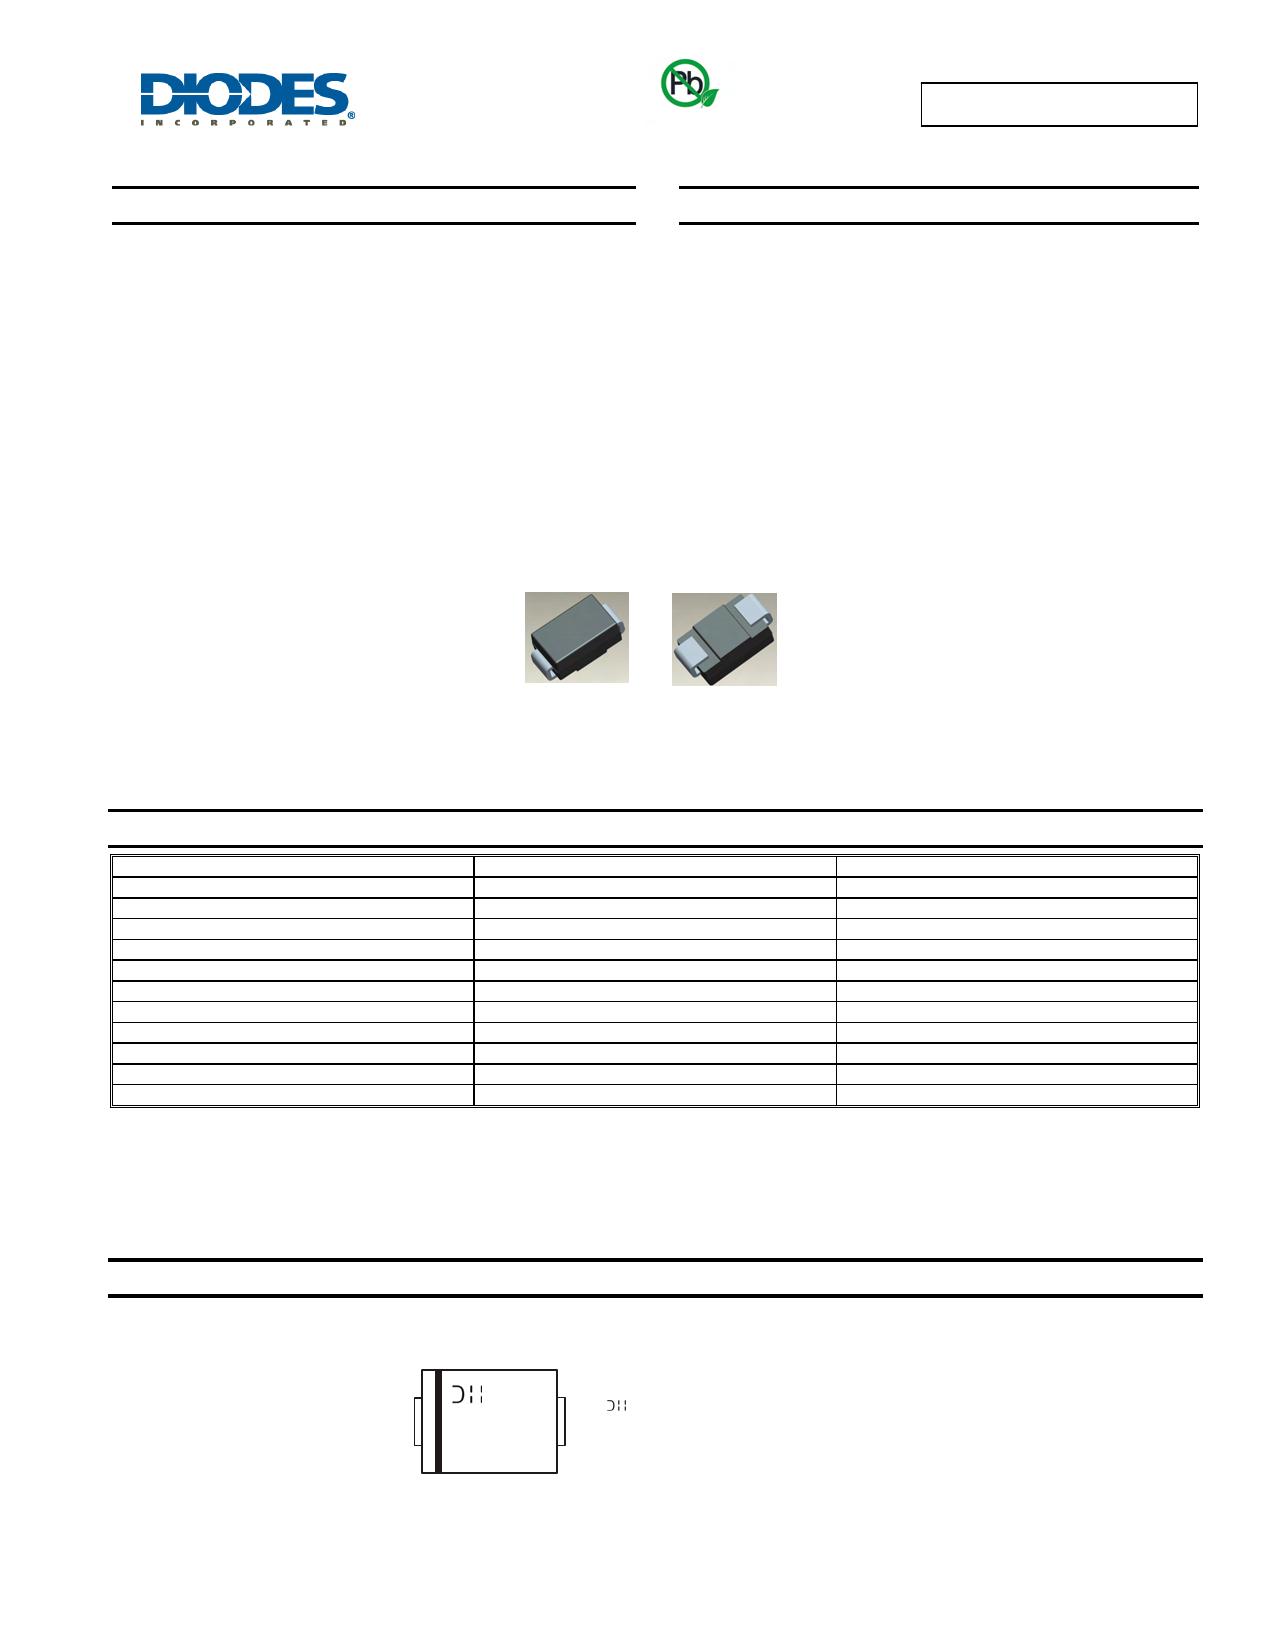 TB2600M datasheet